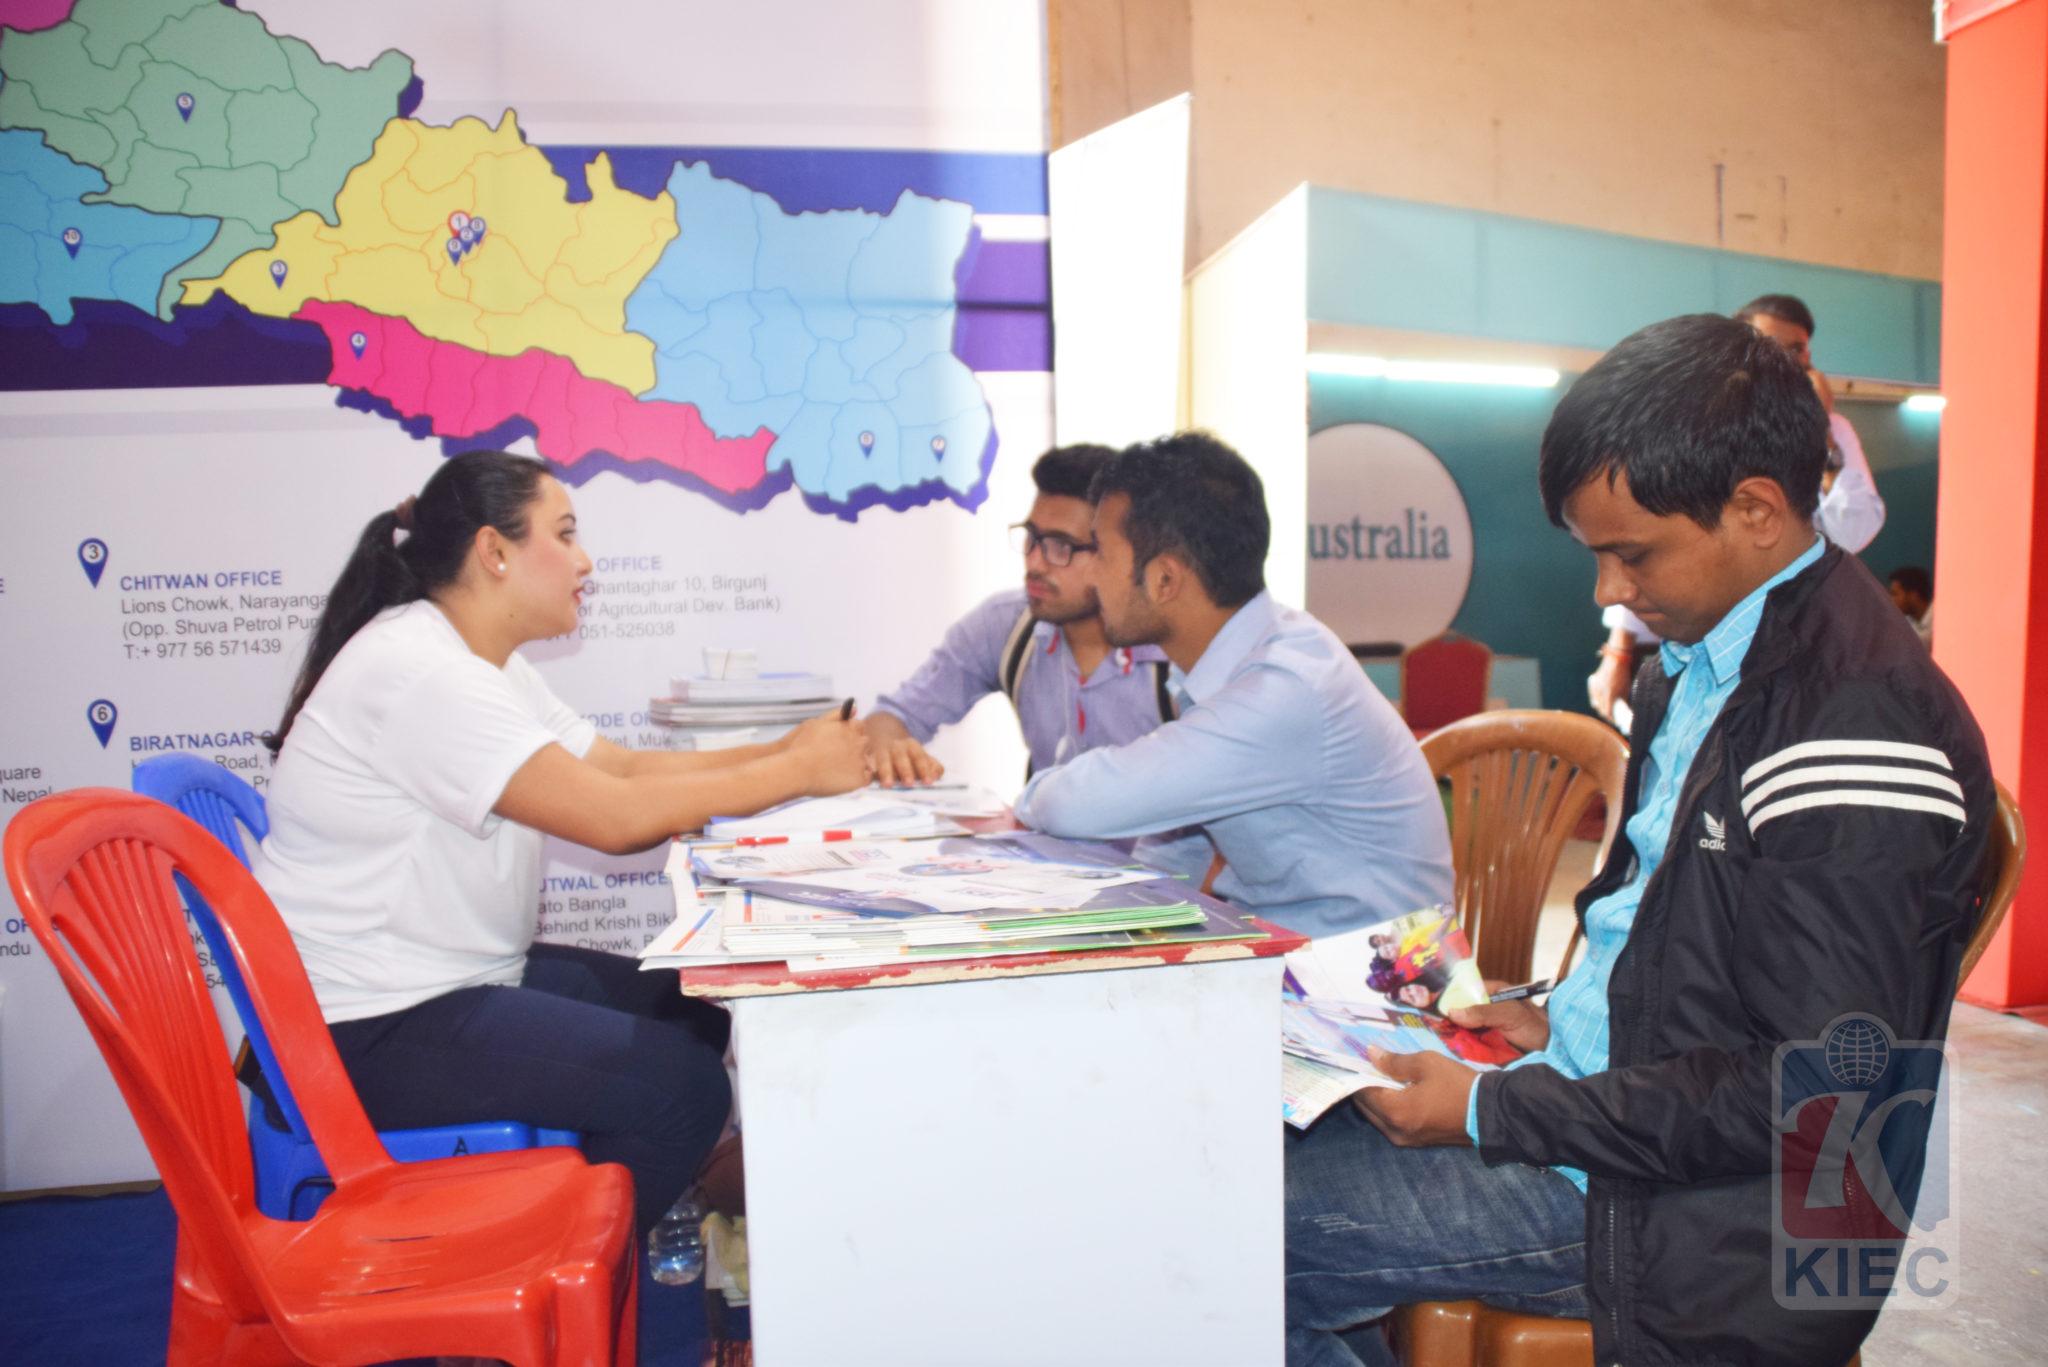 KIEC Counsellor Pratiksha Shrestha with Visitors